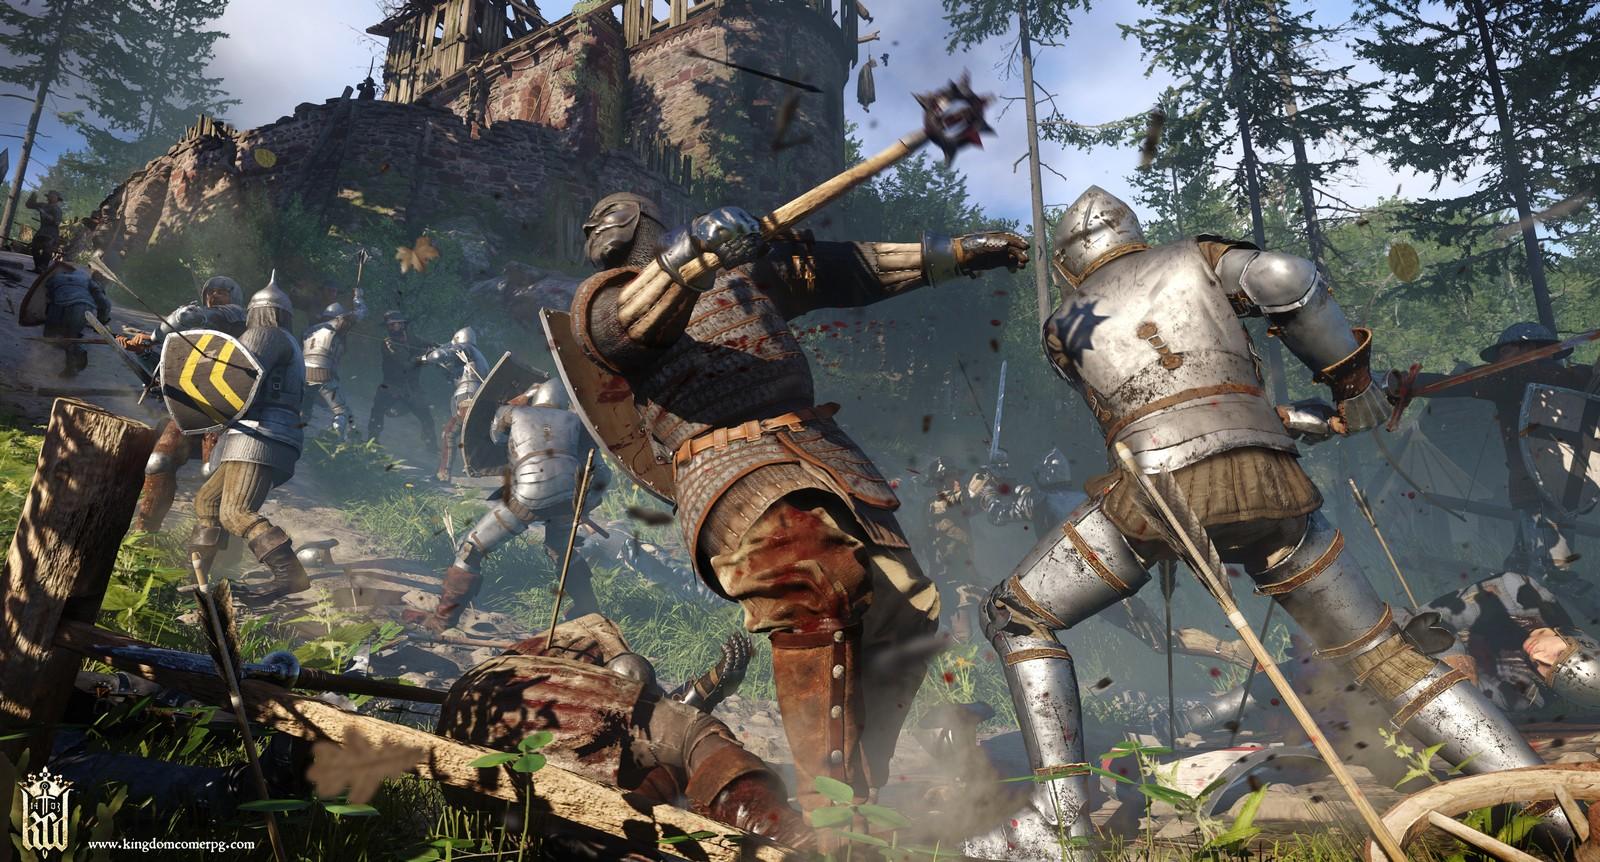 Kingdom Come Deliverance Developer Already Has Sequel Planned Pc Game Ps4 Romance Of The Three Kingdoms Xiii Reg 3 Gamer